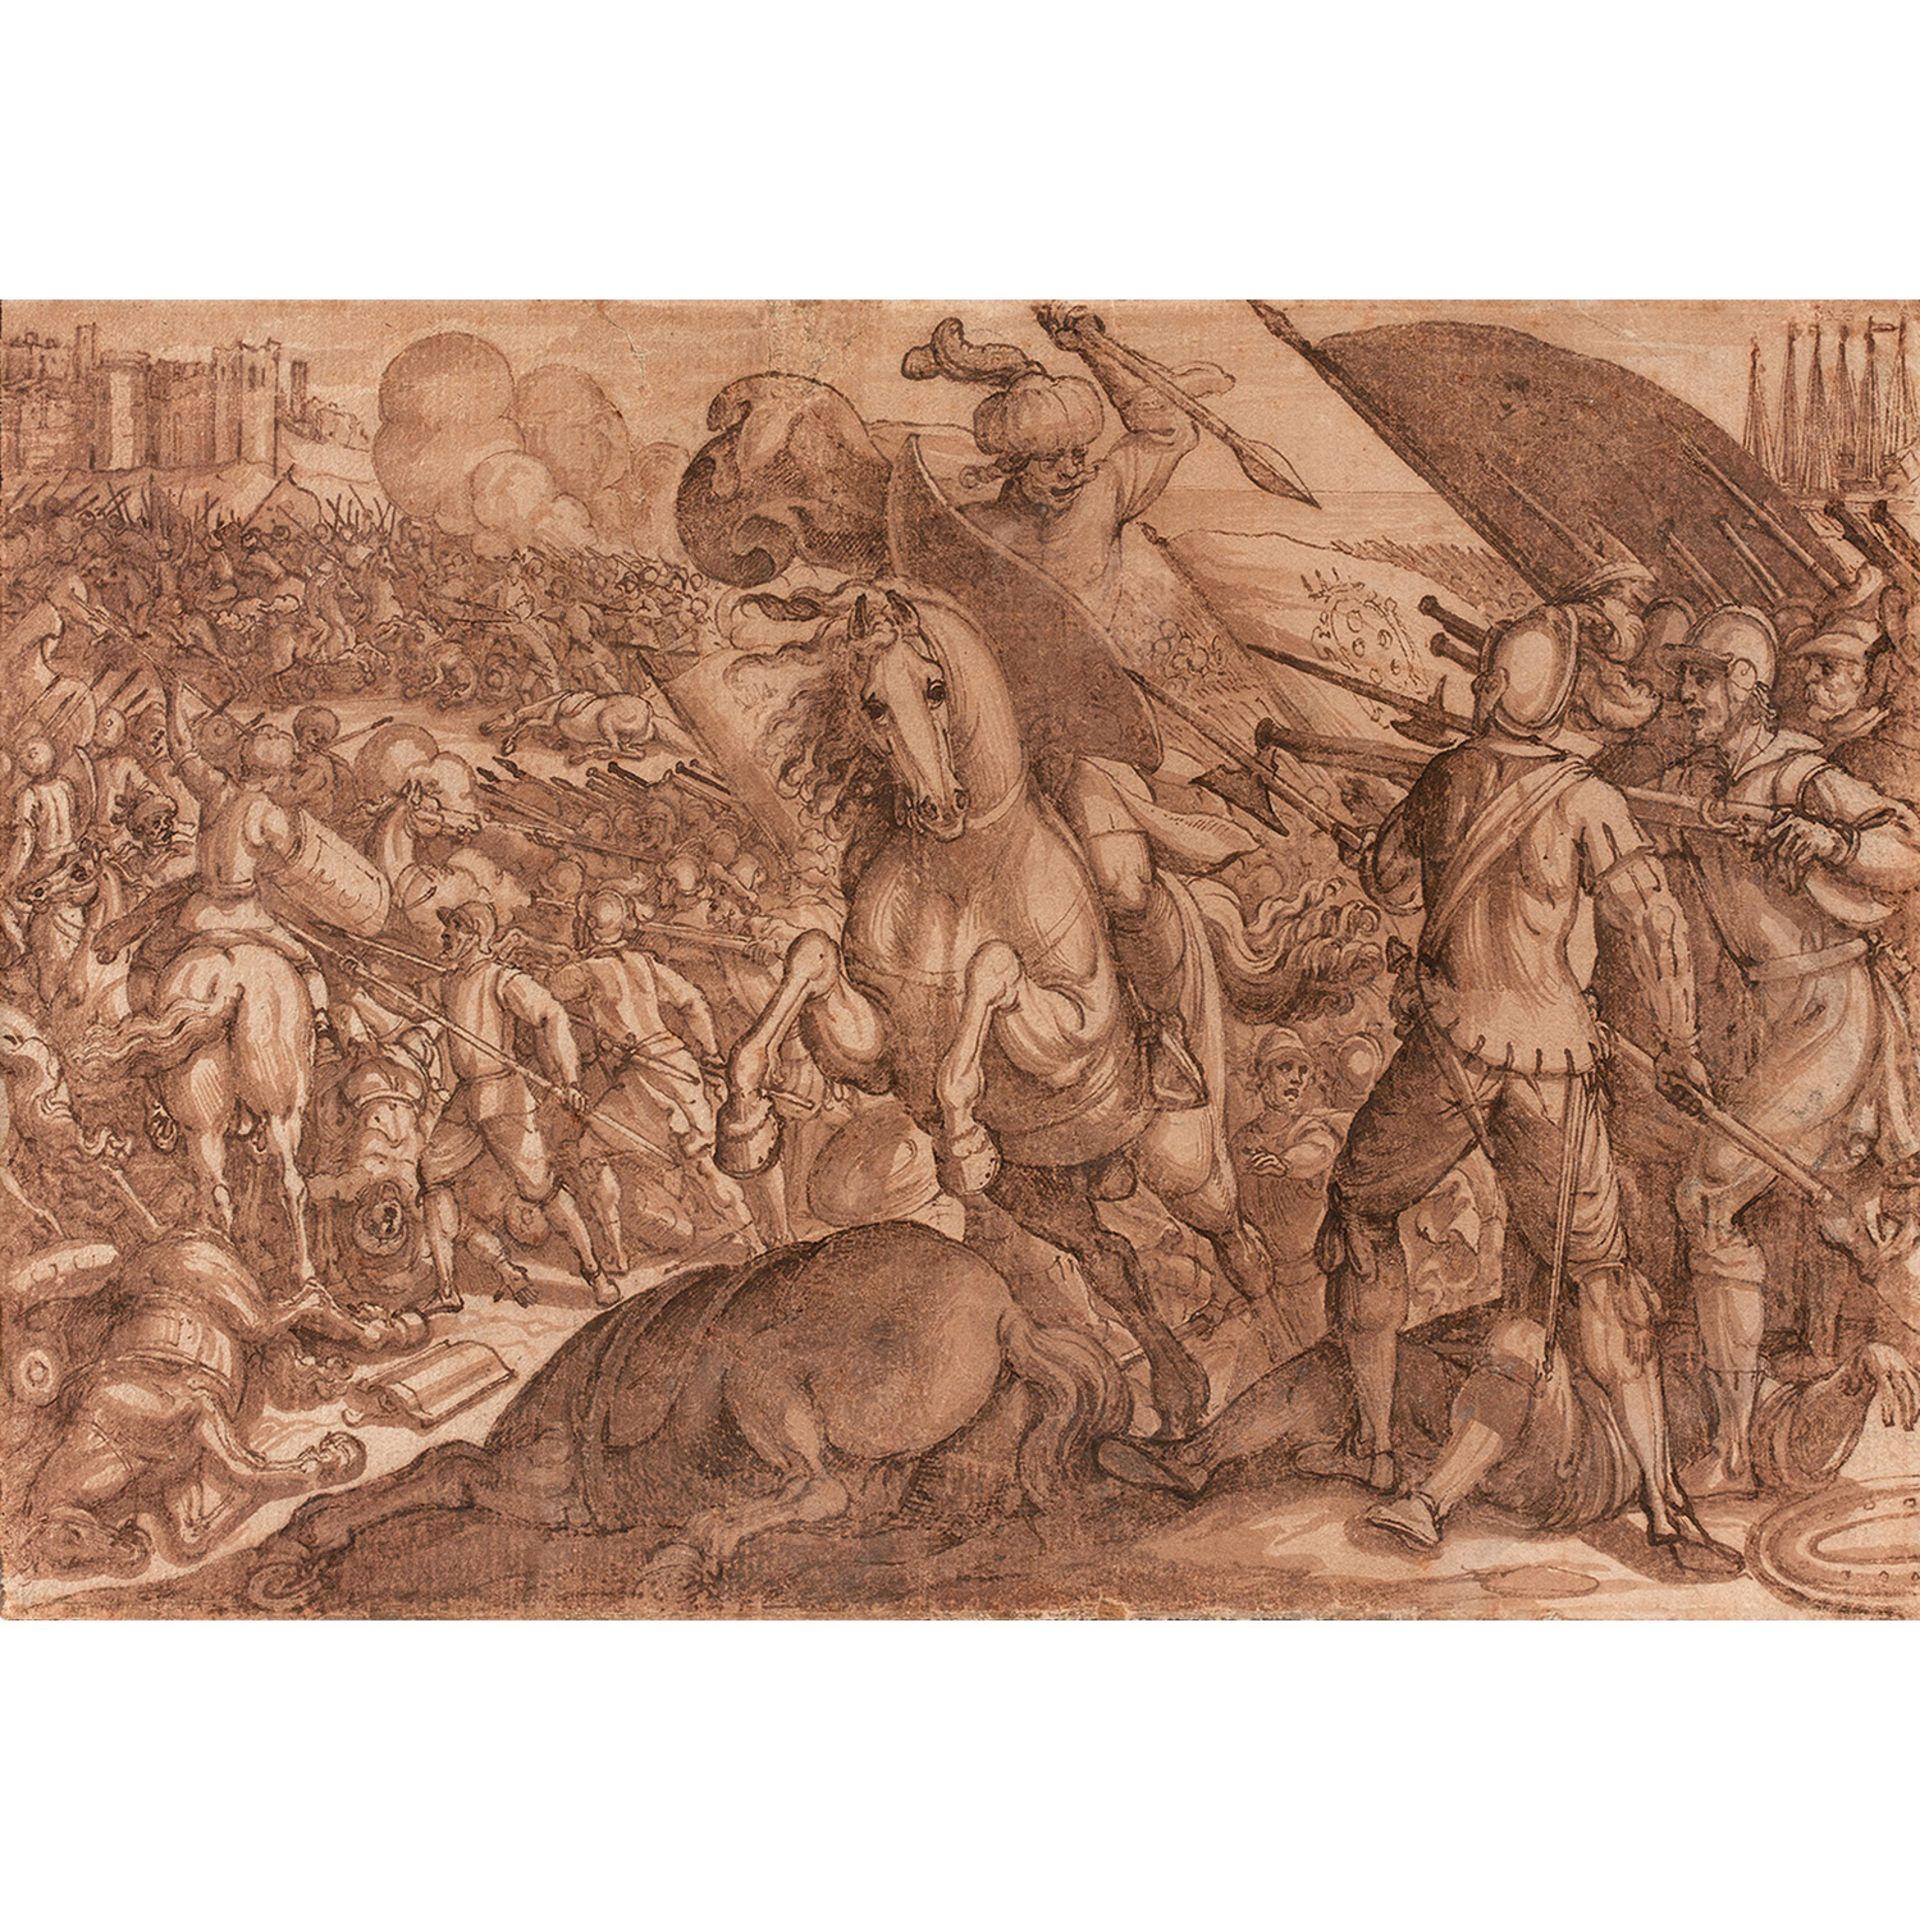 ANTONIO TEMPESTA (Florence 1555-Rome 1630)